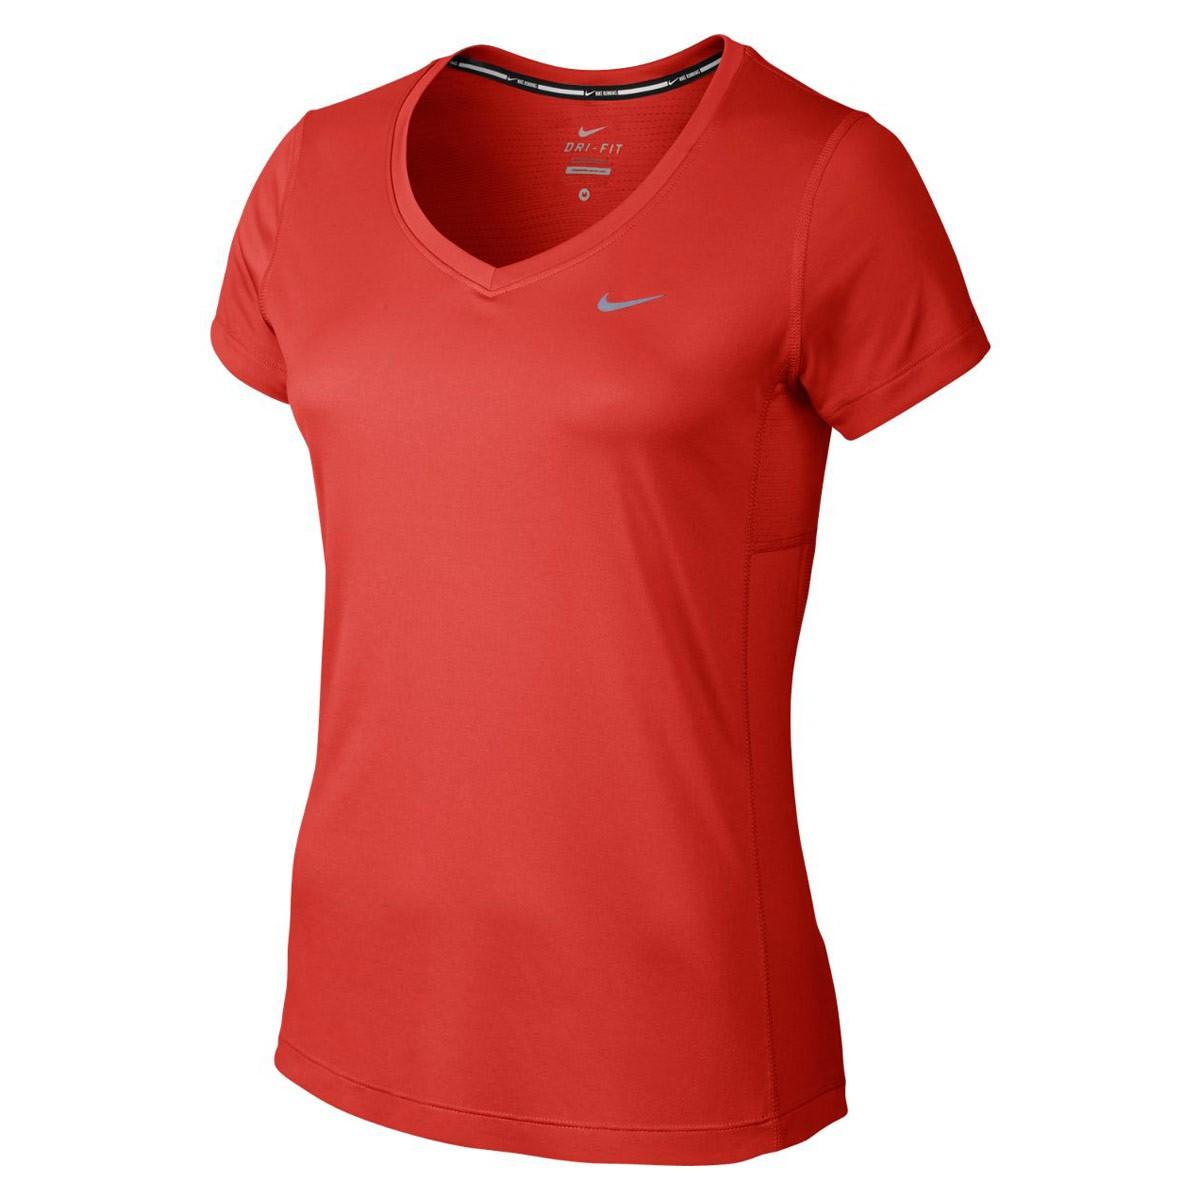 038eb65503dbd Bizz Store - Camiseta Feminina Nike Miller V-Neck Corrida Vermelha